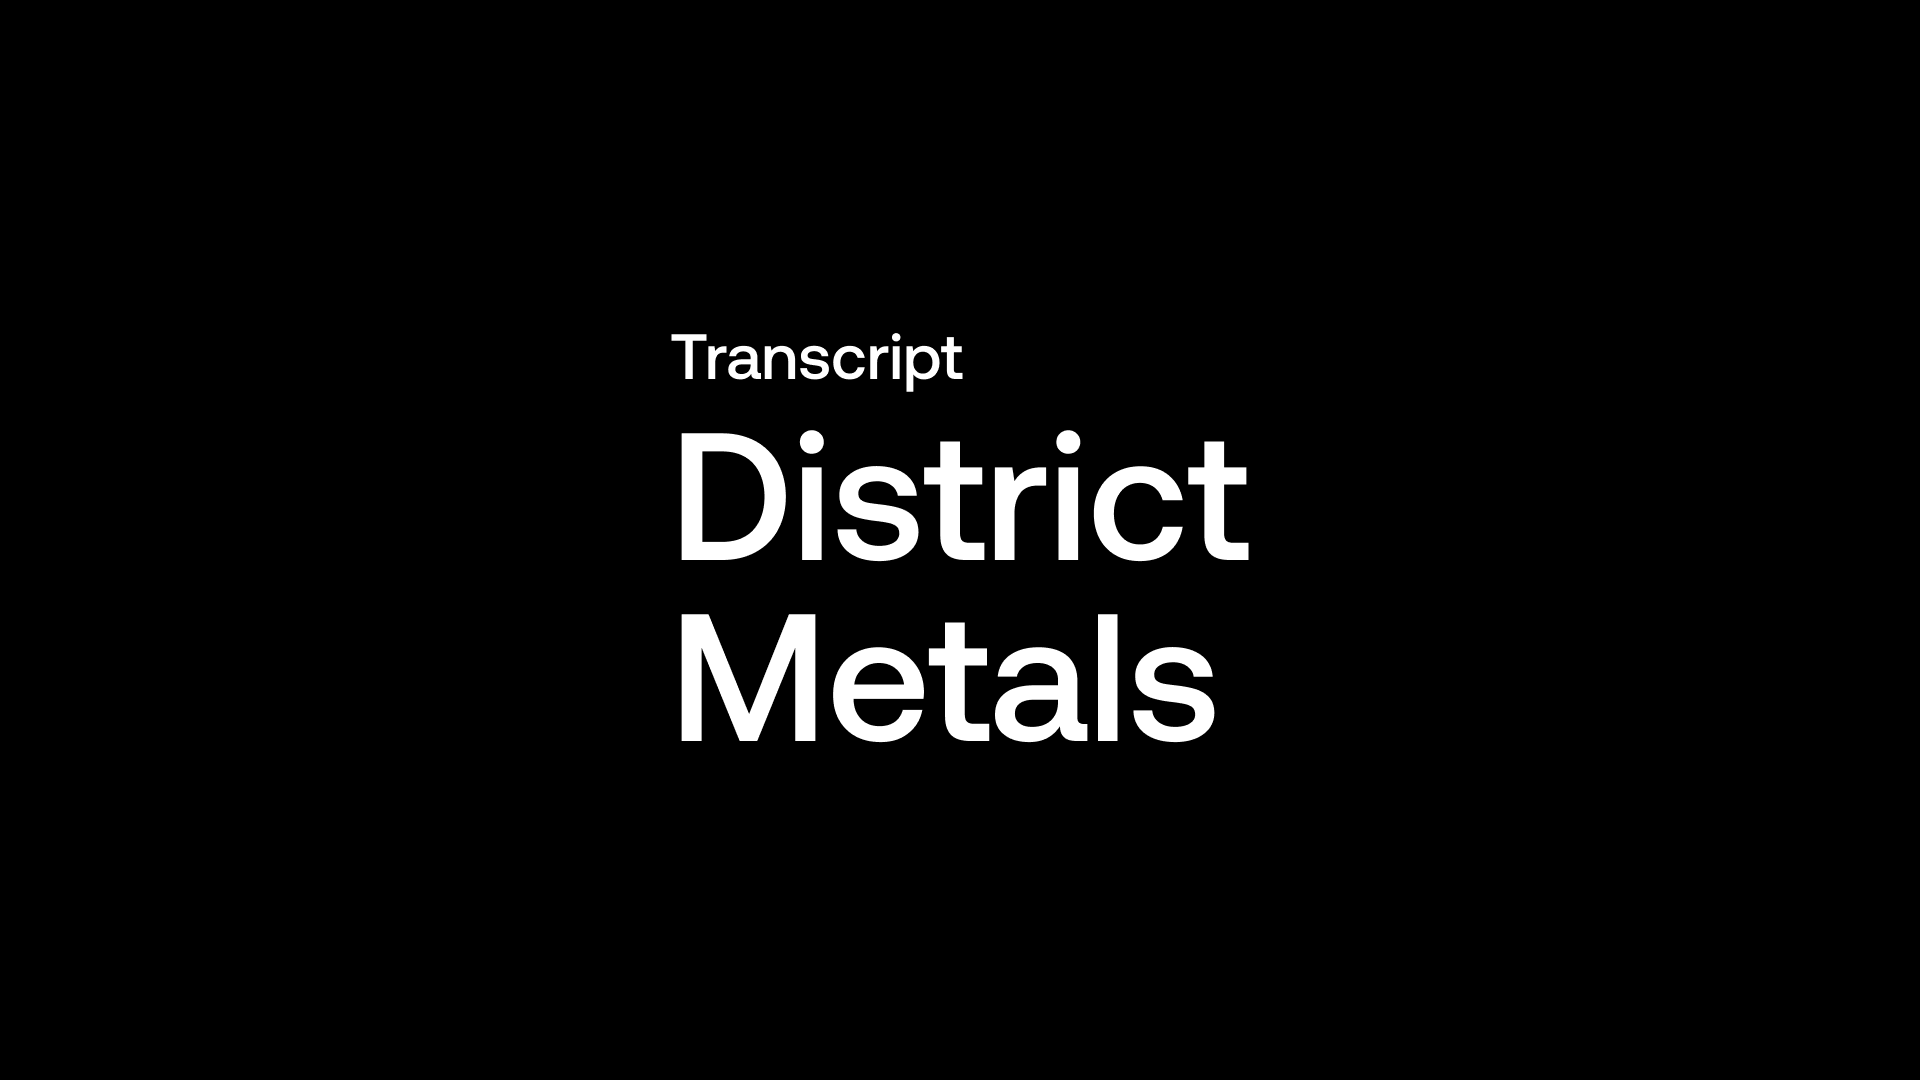 Transcript: District Metals (DMX) - 10,000m Drilling to Unlock Polymetallic Potential